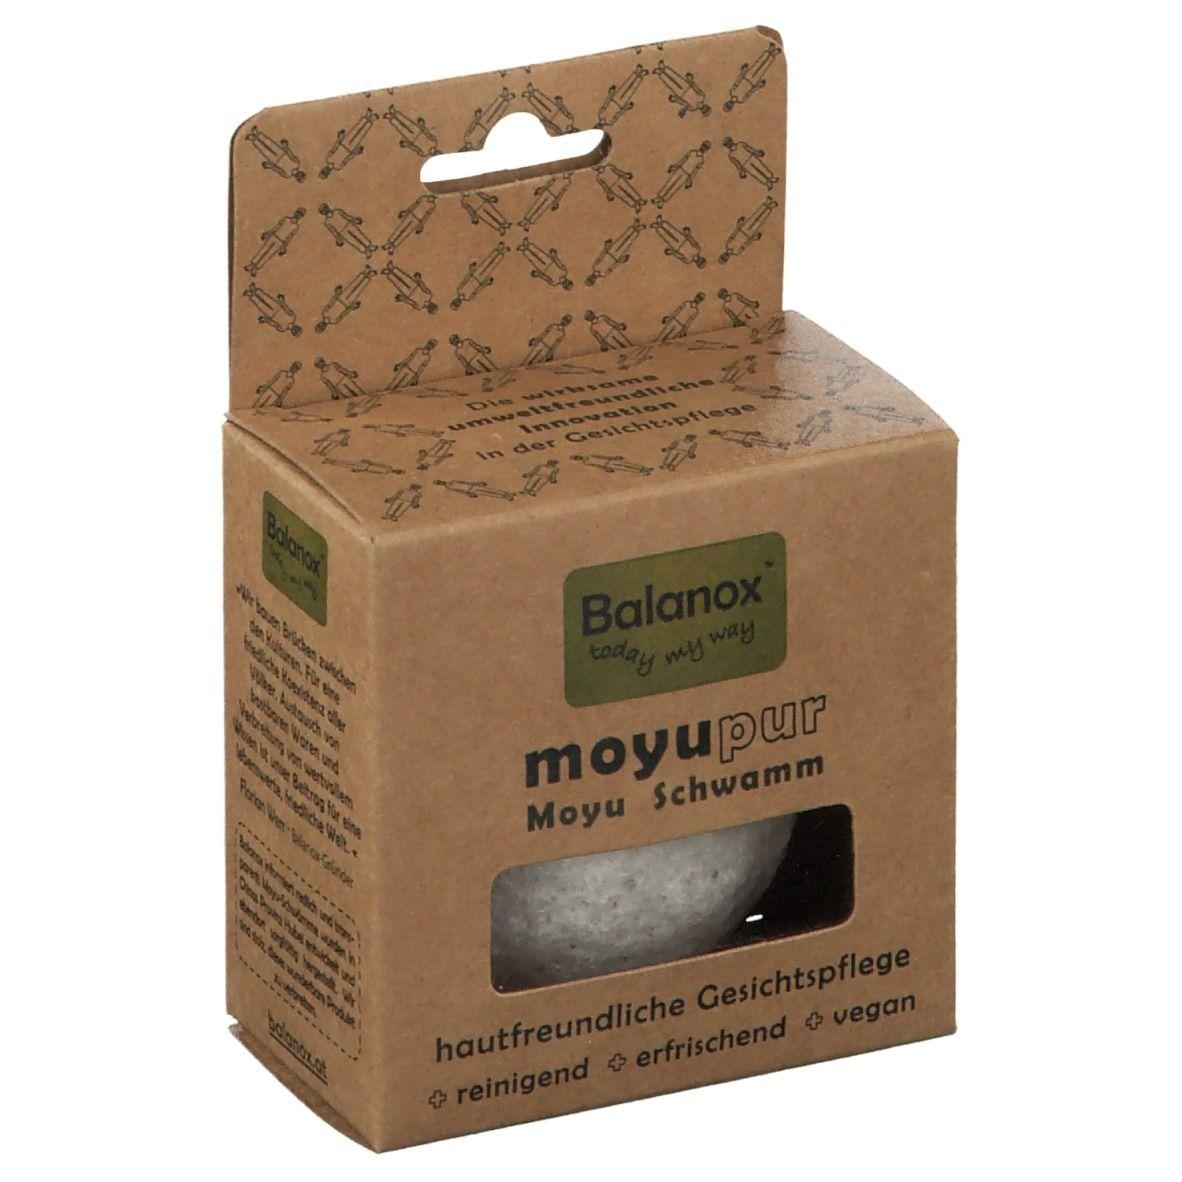 Image of Balanox™ moyupur